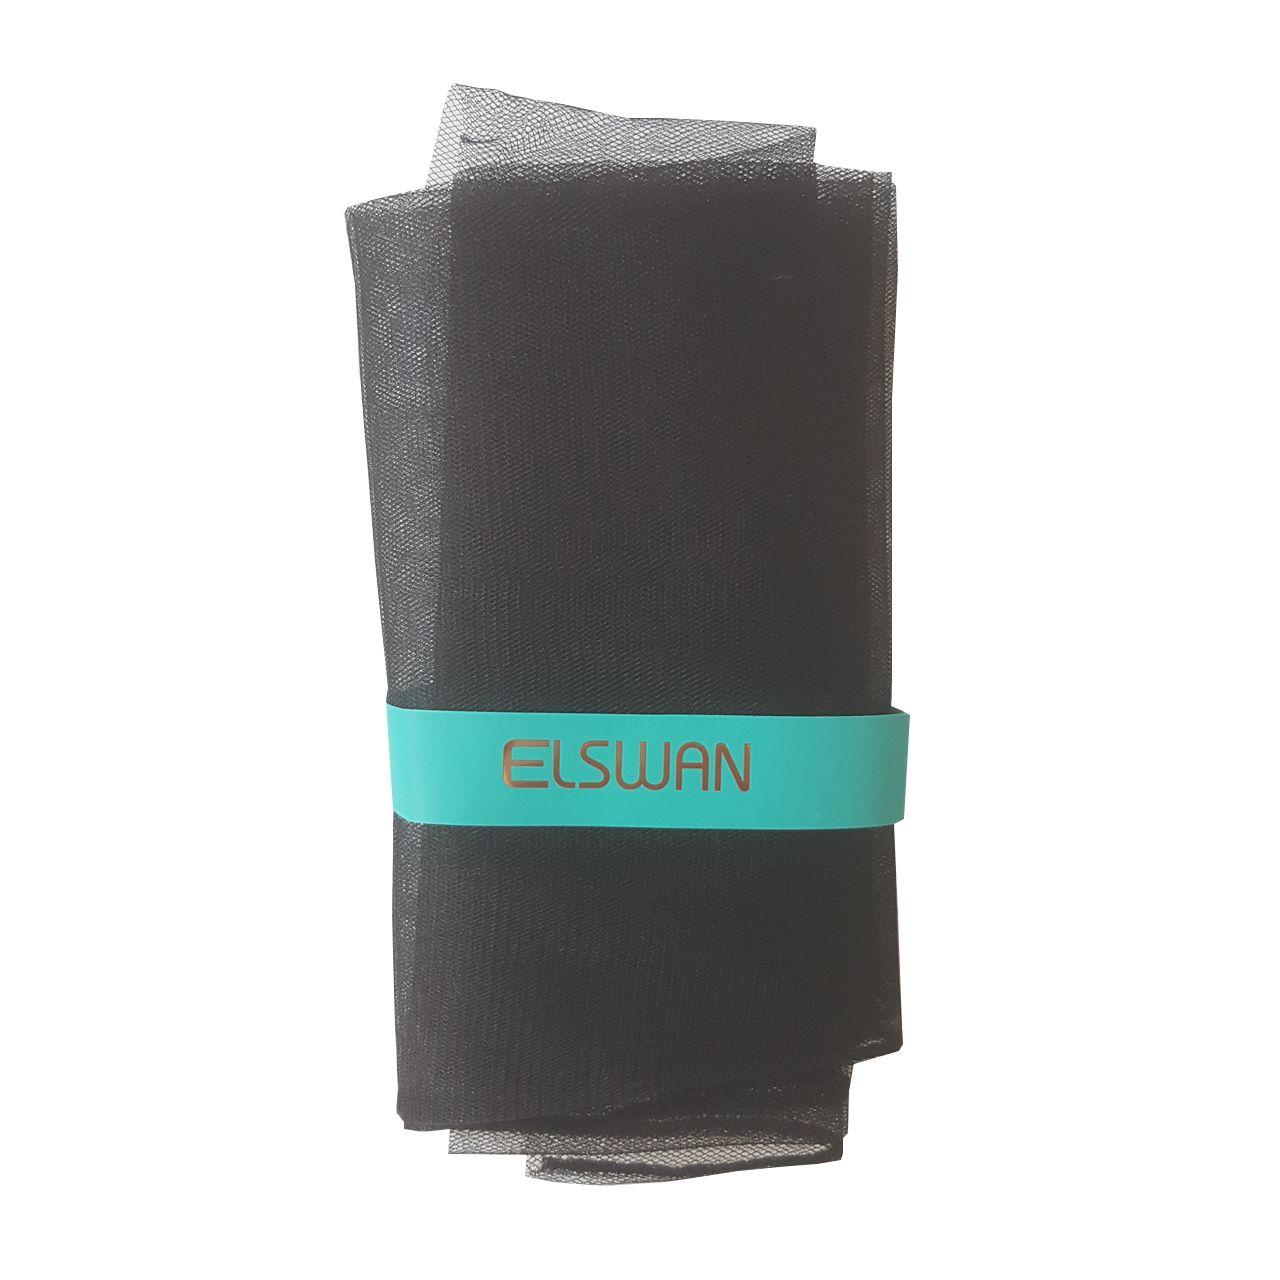 جوراب زنانه ال سون کد PH323 -  - 4